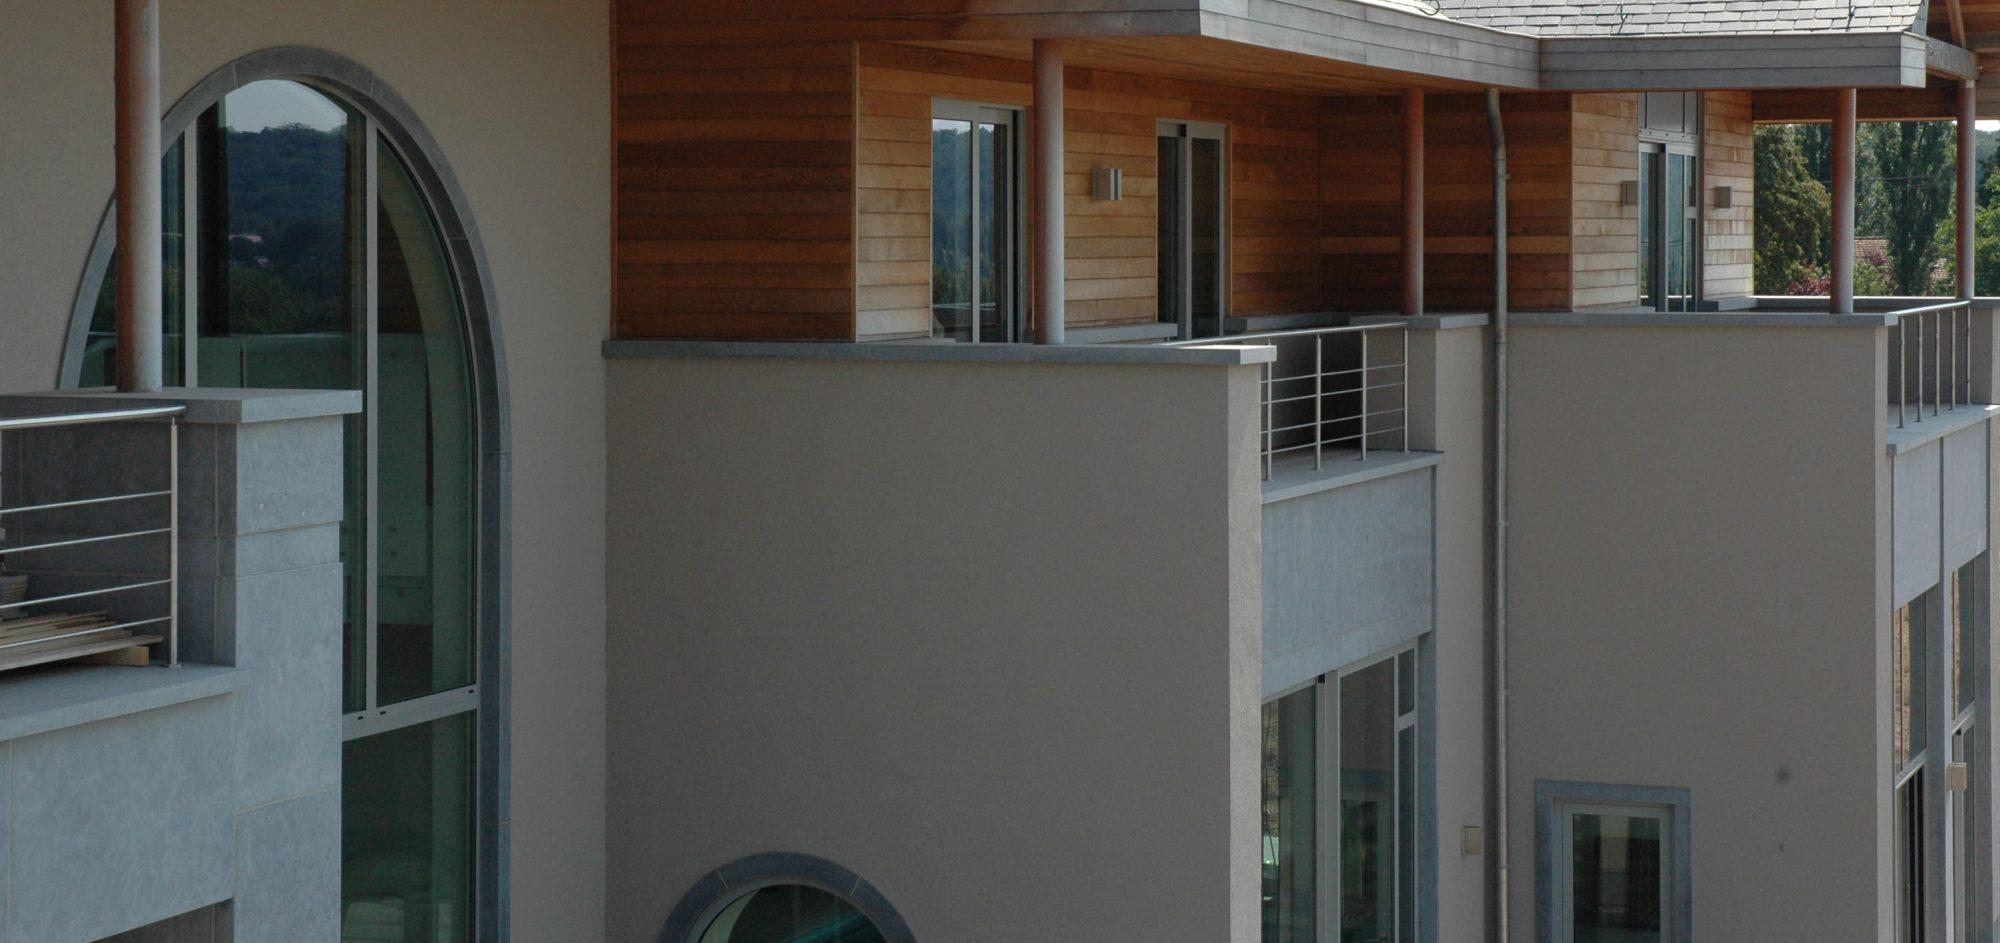 Pierre Bleue Belge - facade ambiance 2